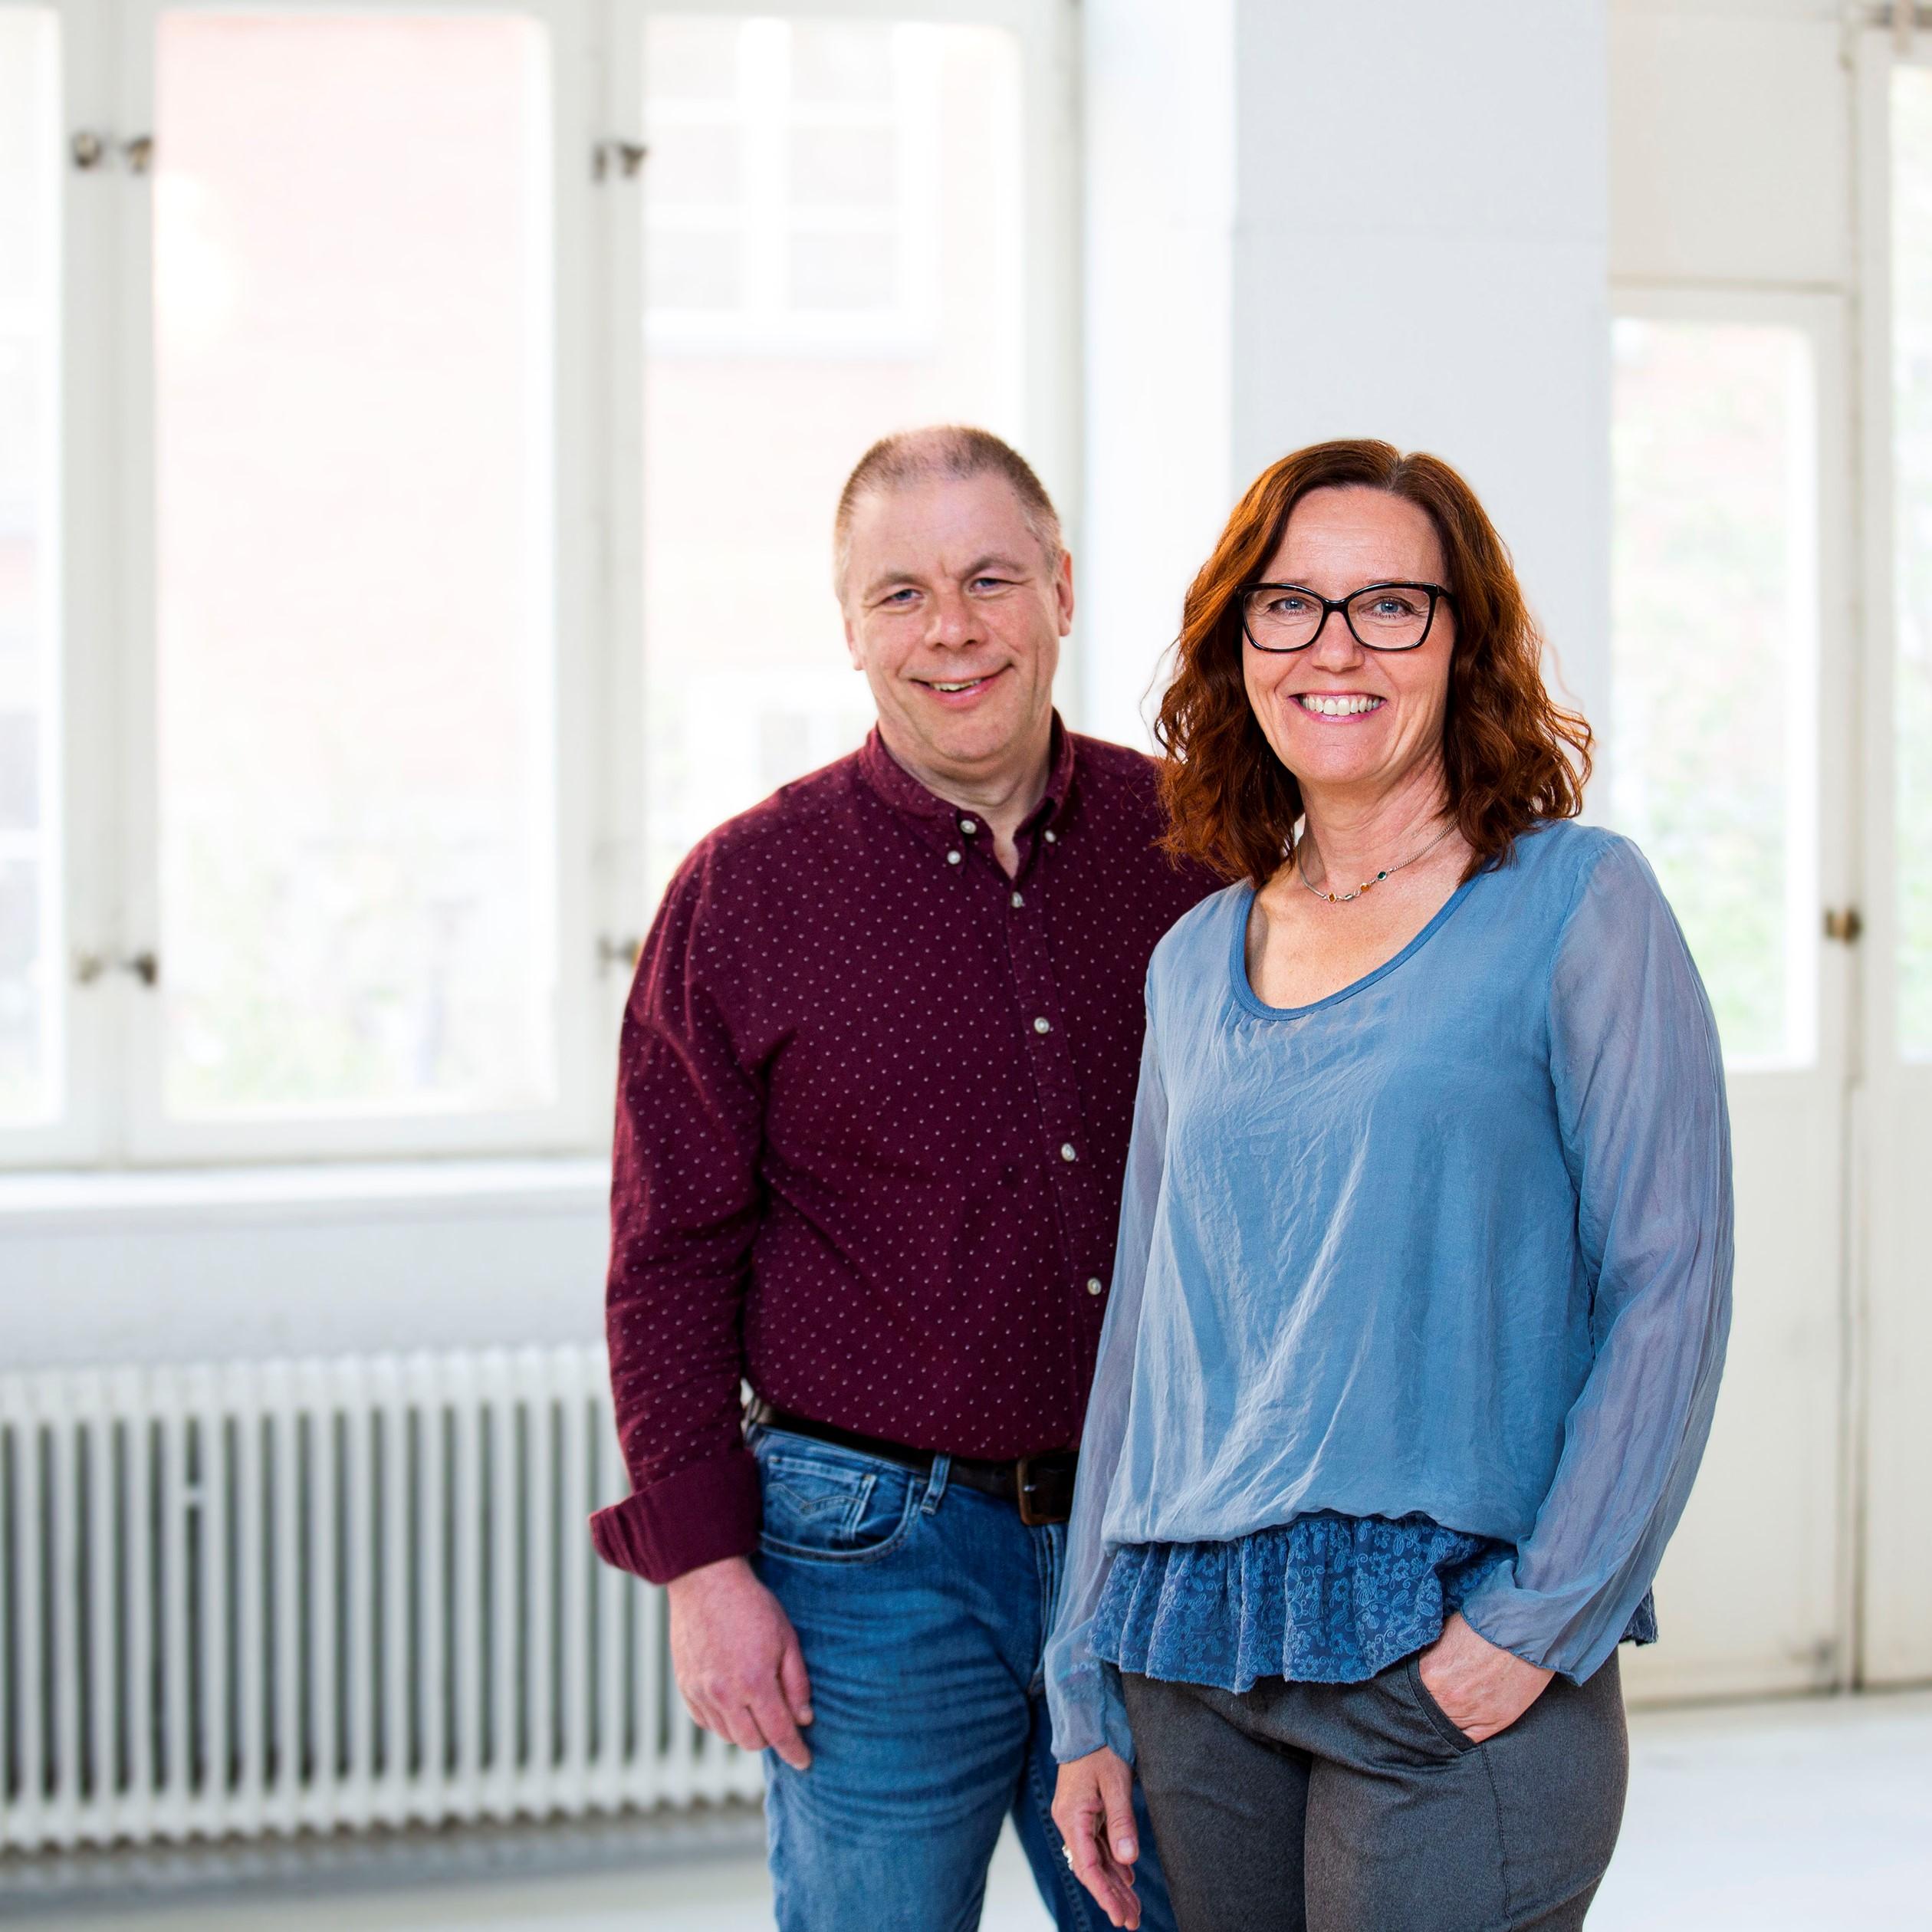 Produktiv Hälsa Sverige AB